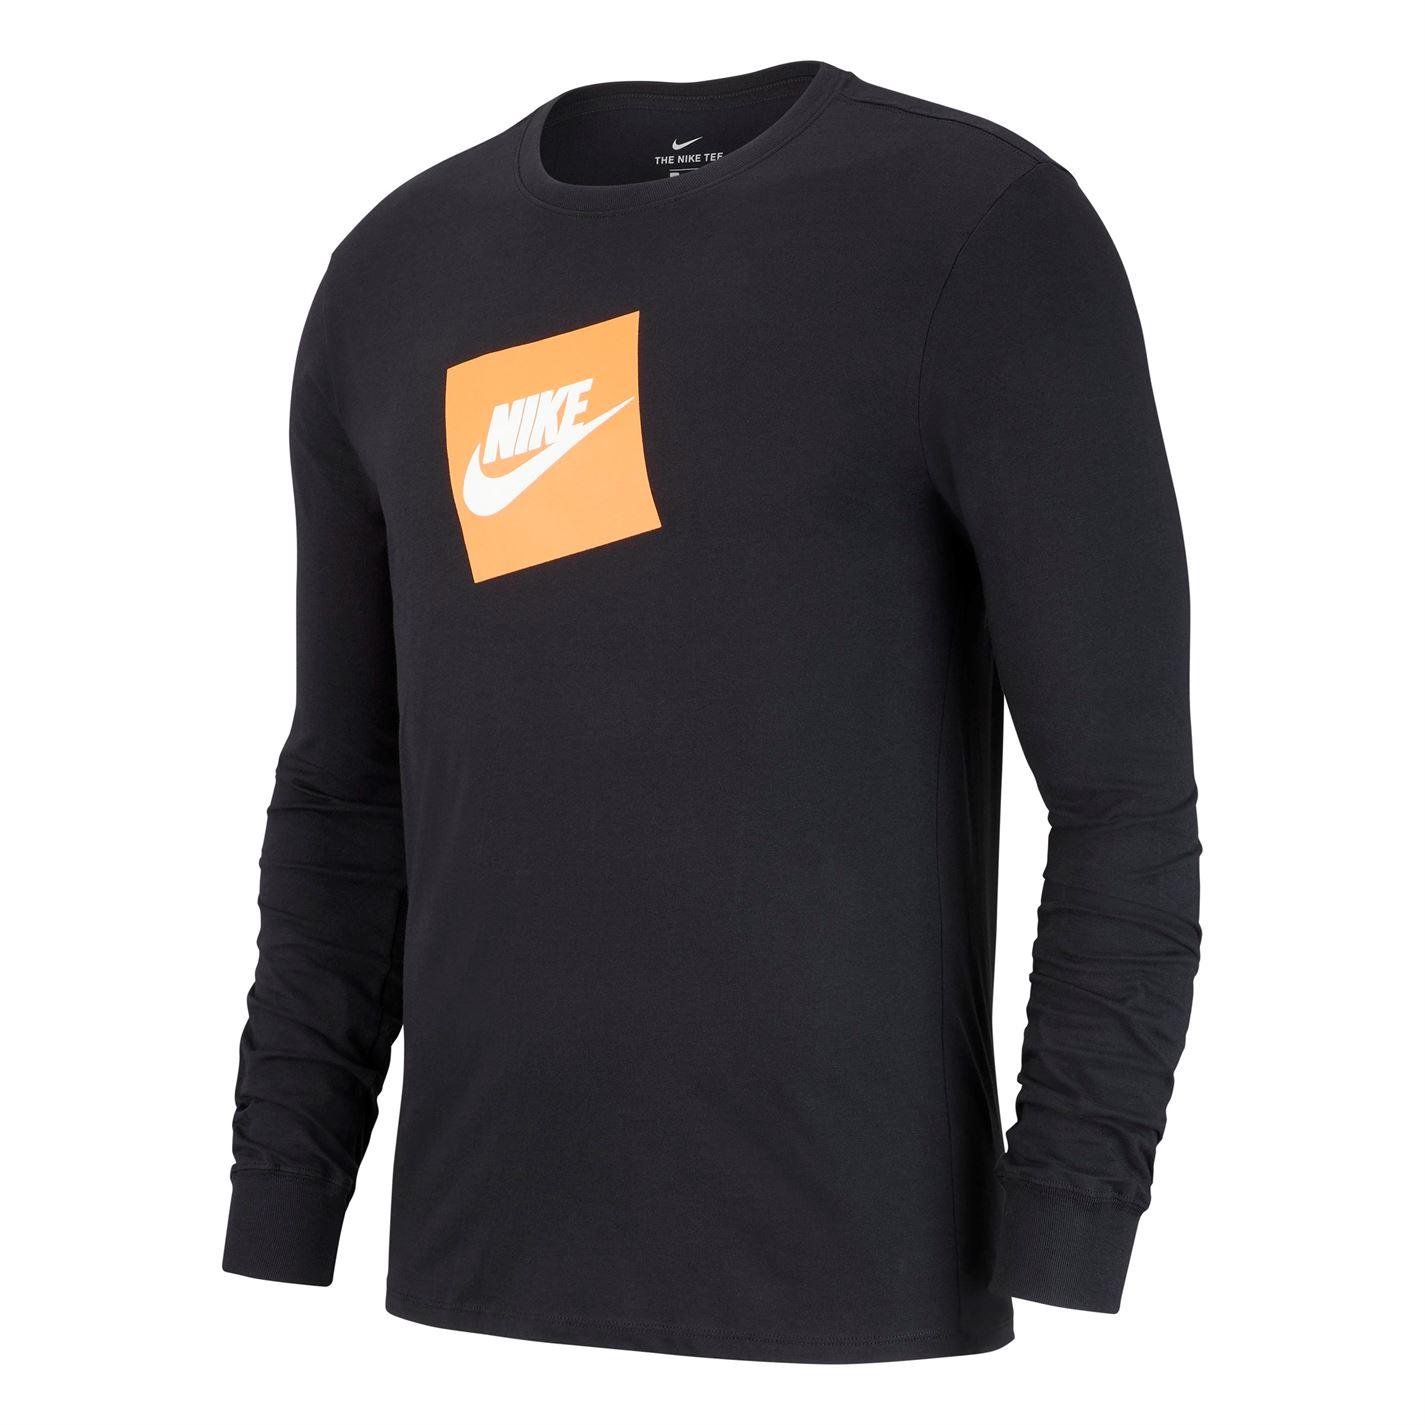 Triko Nike Box HBR Futura Long Sleeve T Shirt